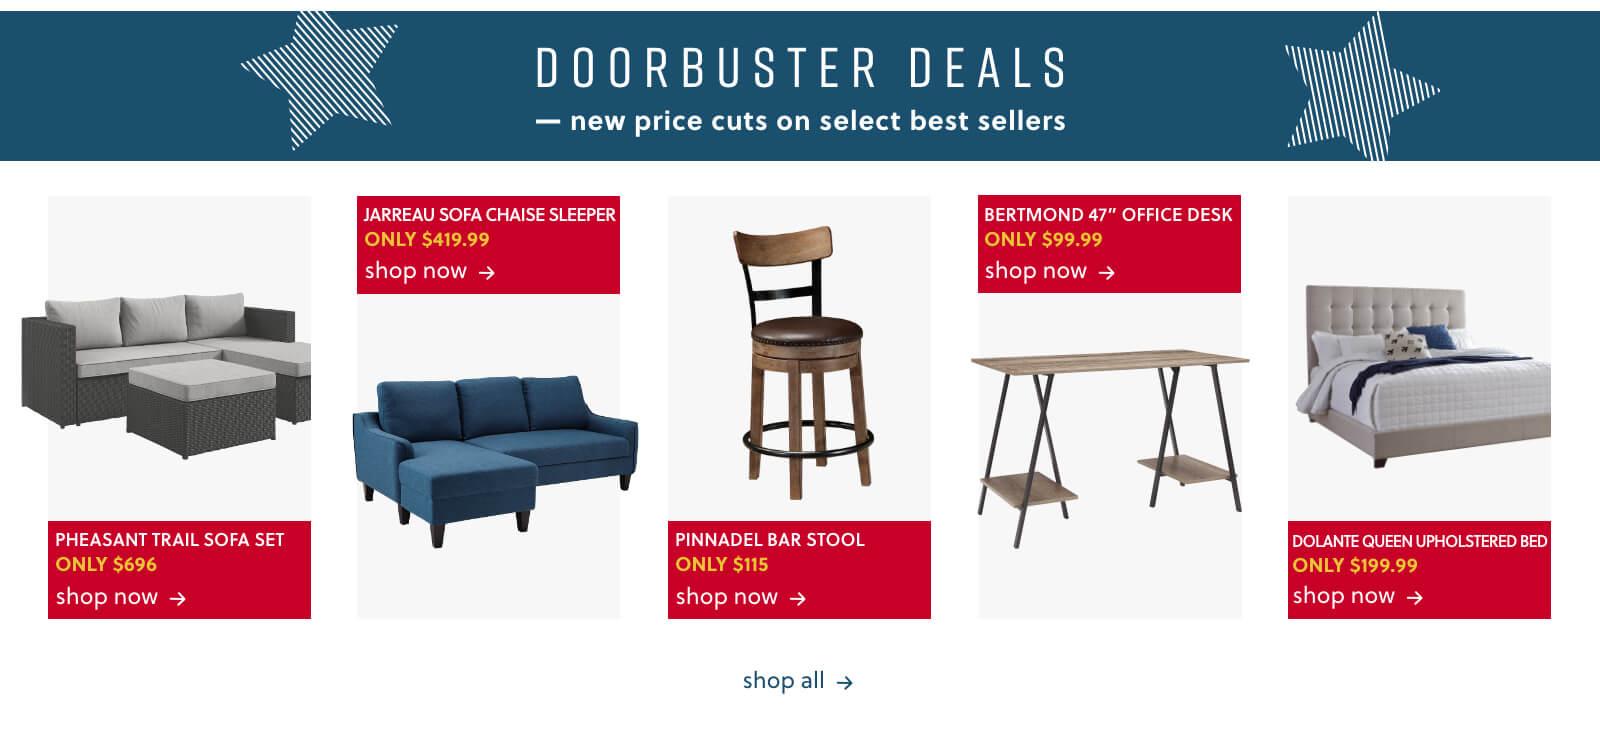 sofa shops glasgow city centre ellis home furnishings sleeper ashley furniture homestore decor pheasant trail sectional jarreau dolante upholstered bed bertmond office desk